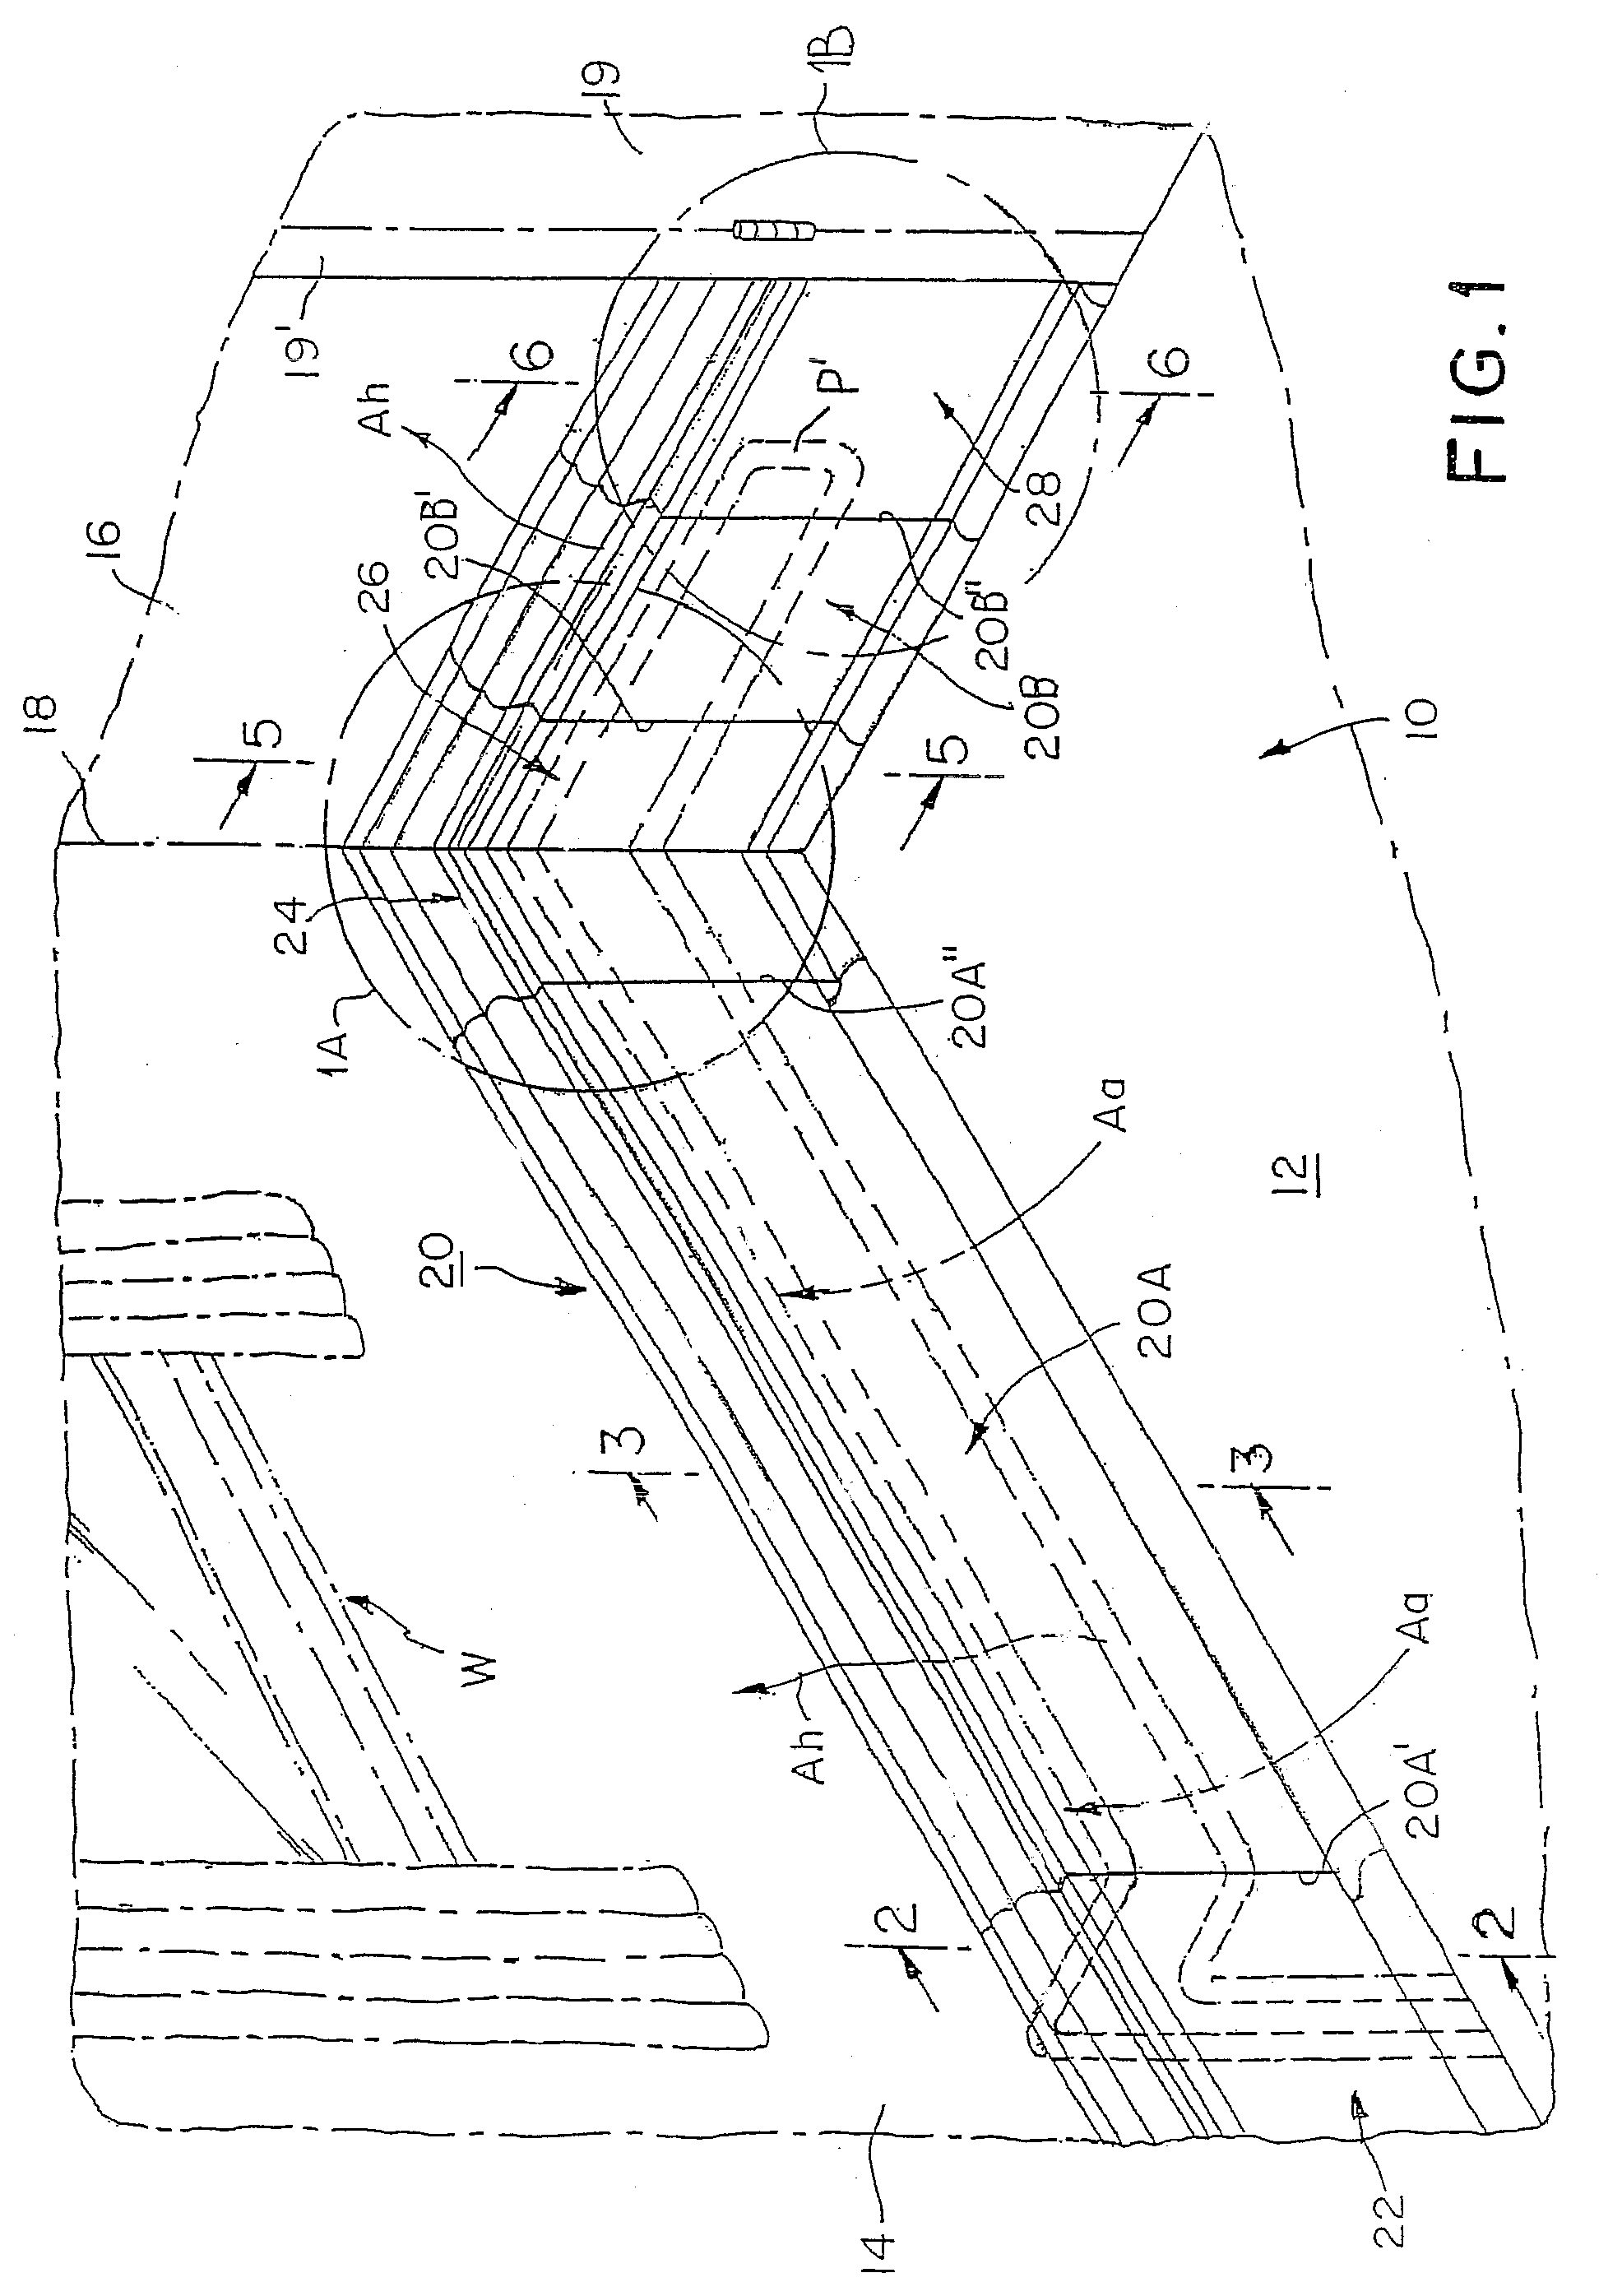 Fantastic Baseboard Heaters Diagram Wiring X3Cbx3Ediagramx3C Bx3E 240V Wiring Digital Resources Remcakbiperorg